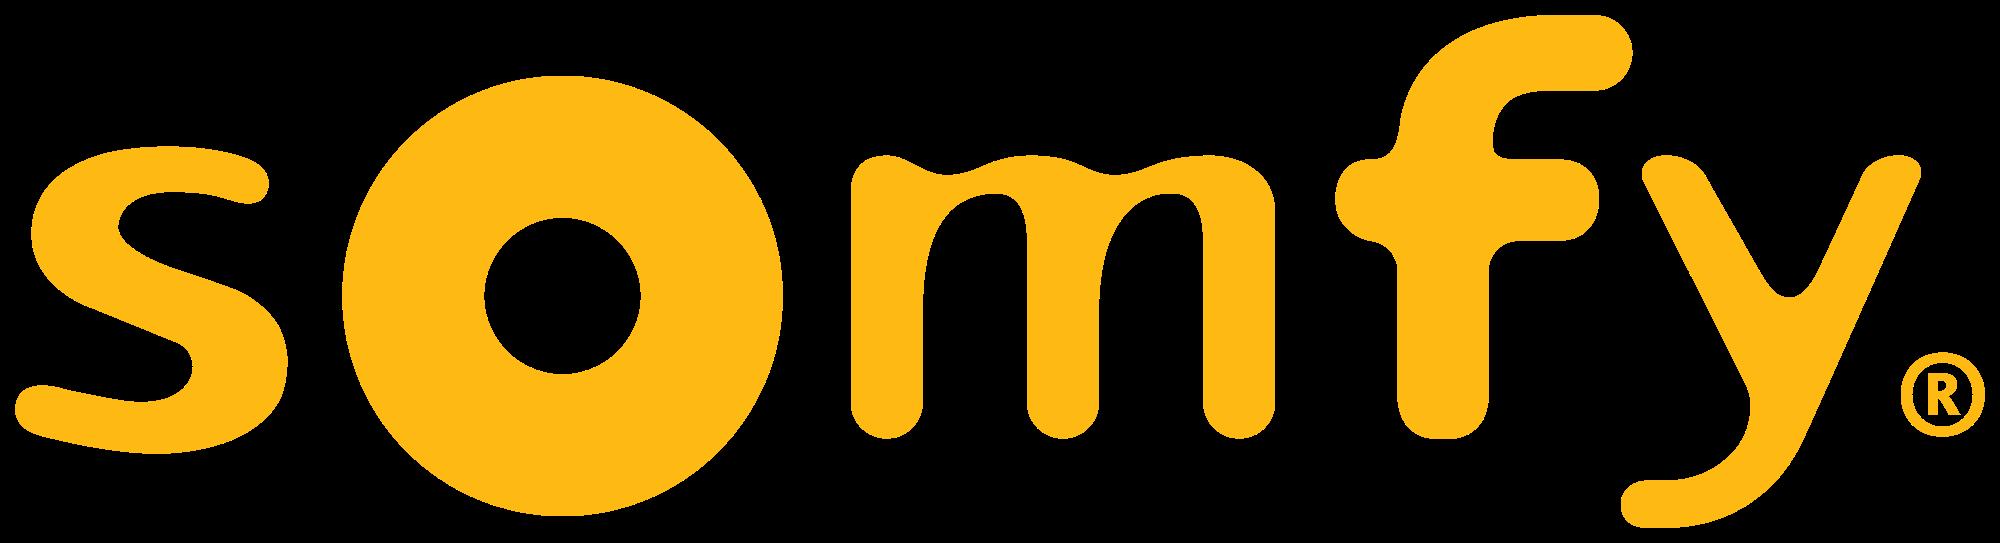 Somfy Buismotoren